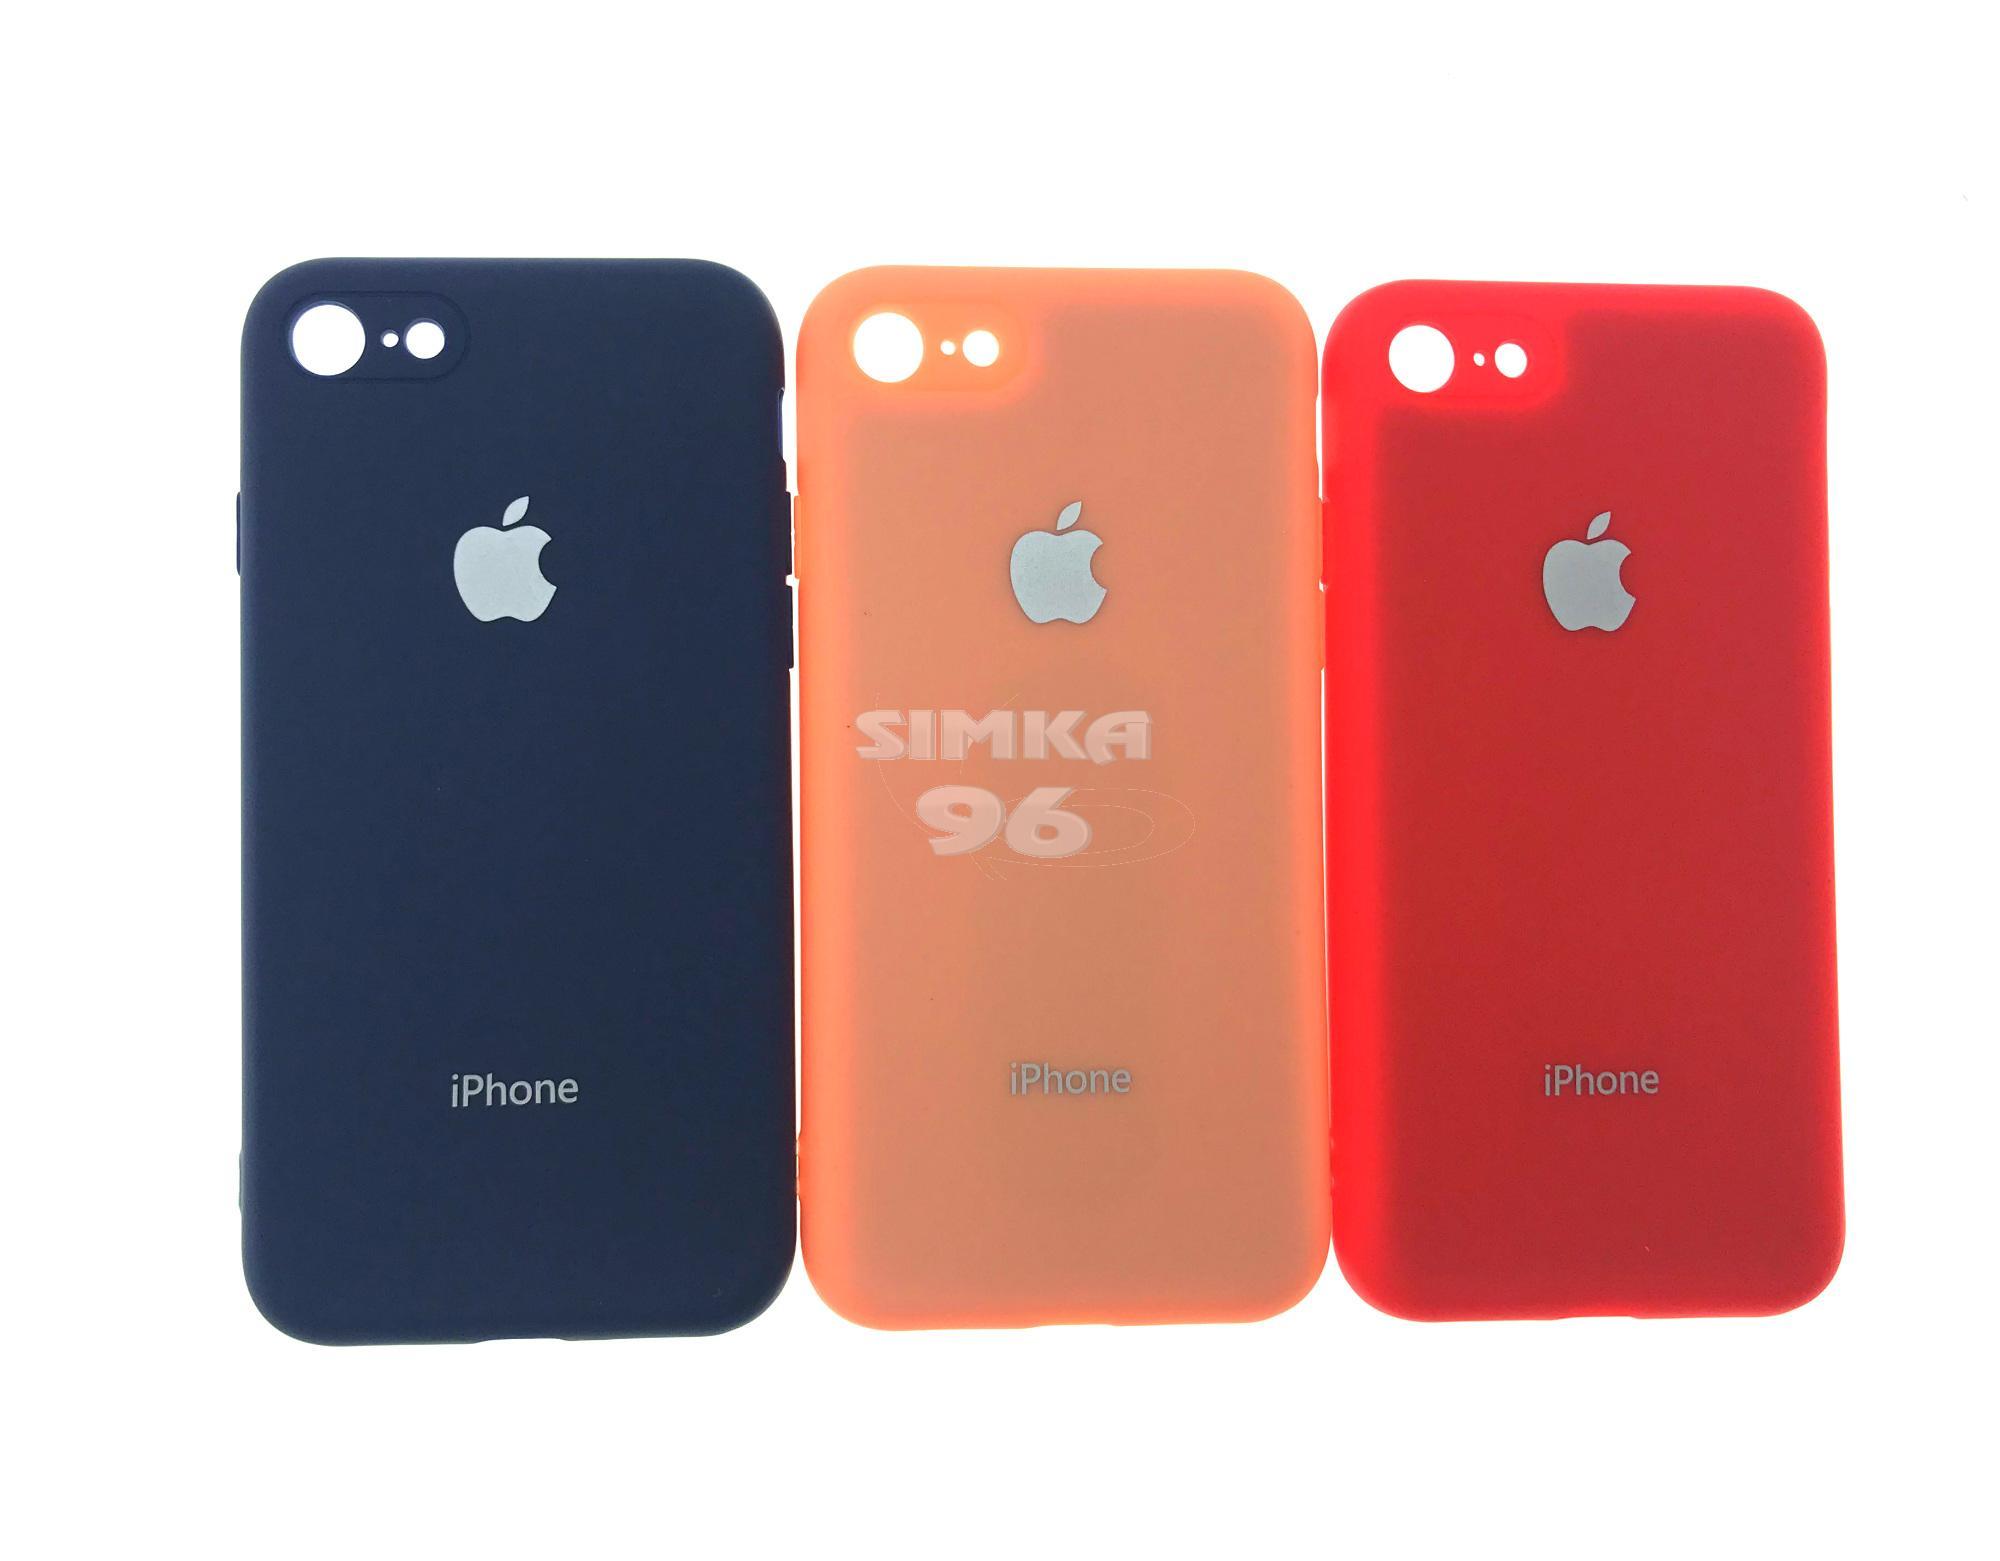 Чехол задник для iPhone 7 Silicone Case (копия)